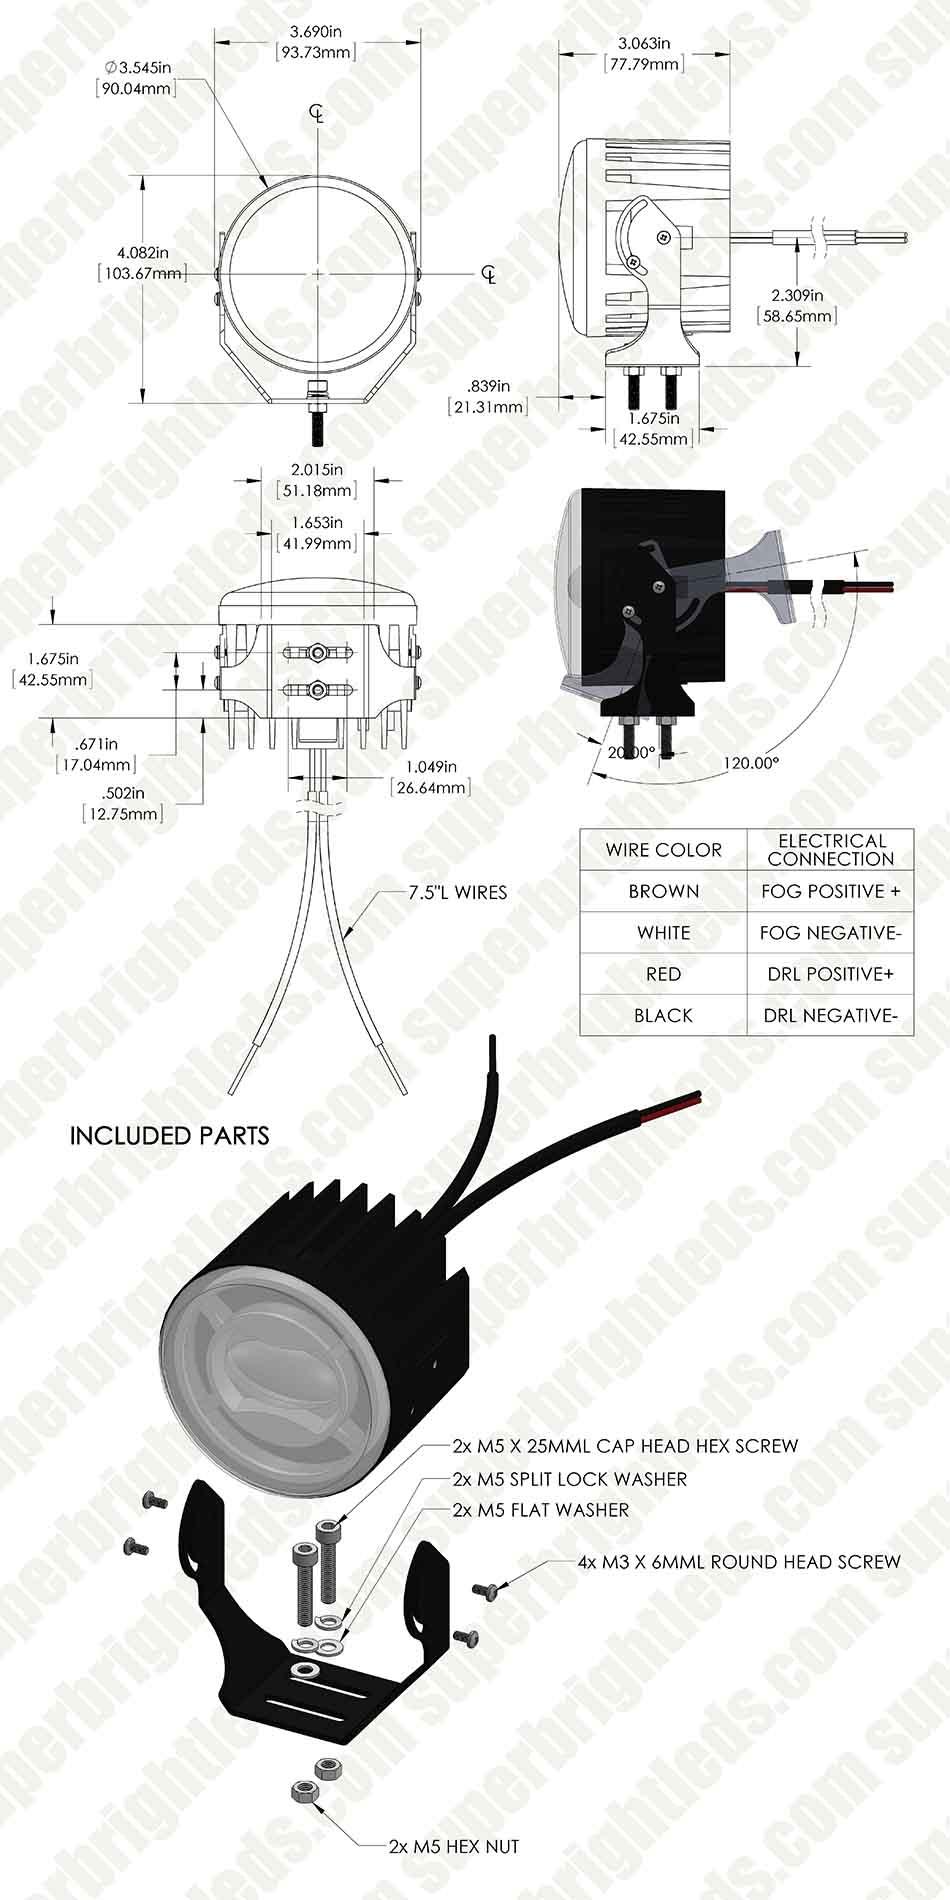 3 1 2 Led Projector Fog Lights Conversion Kit W Halo Daytime Wiring Diagram Light Bulb Running Universal Mount